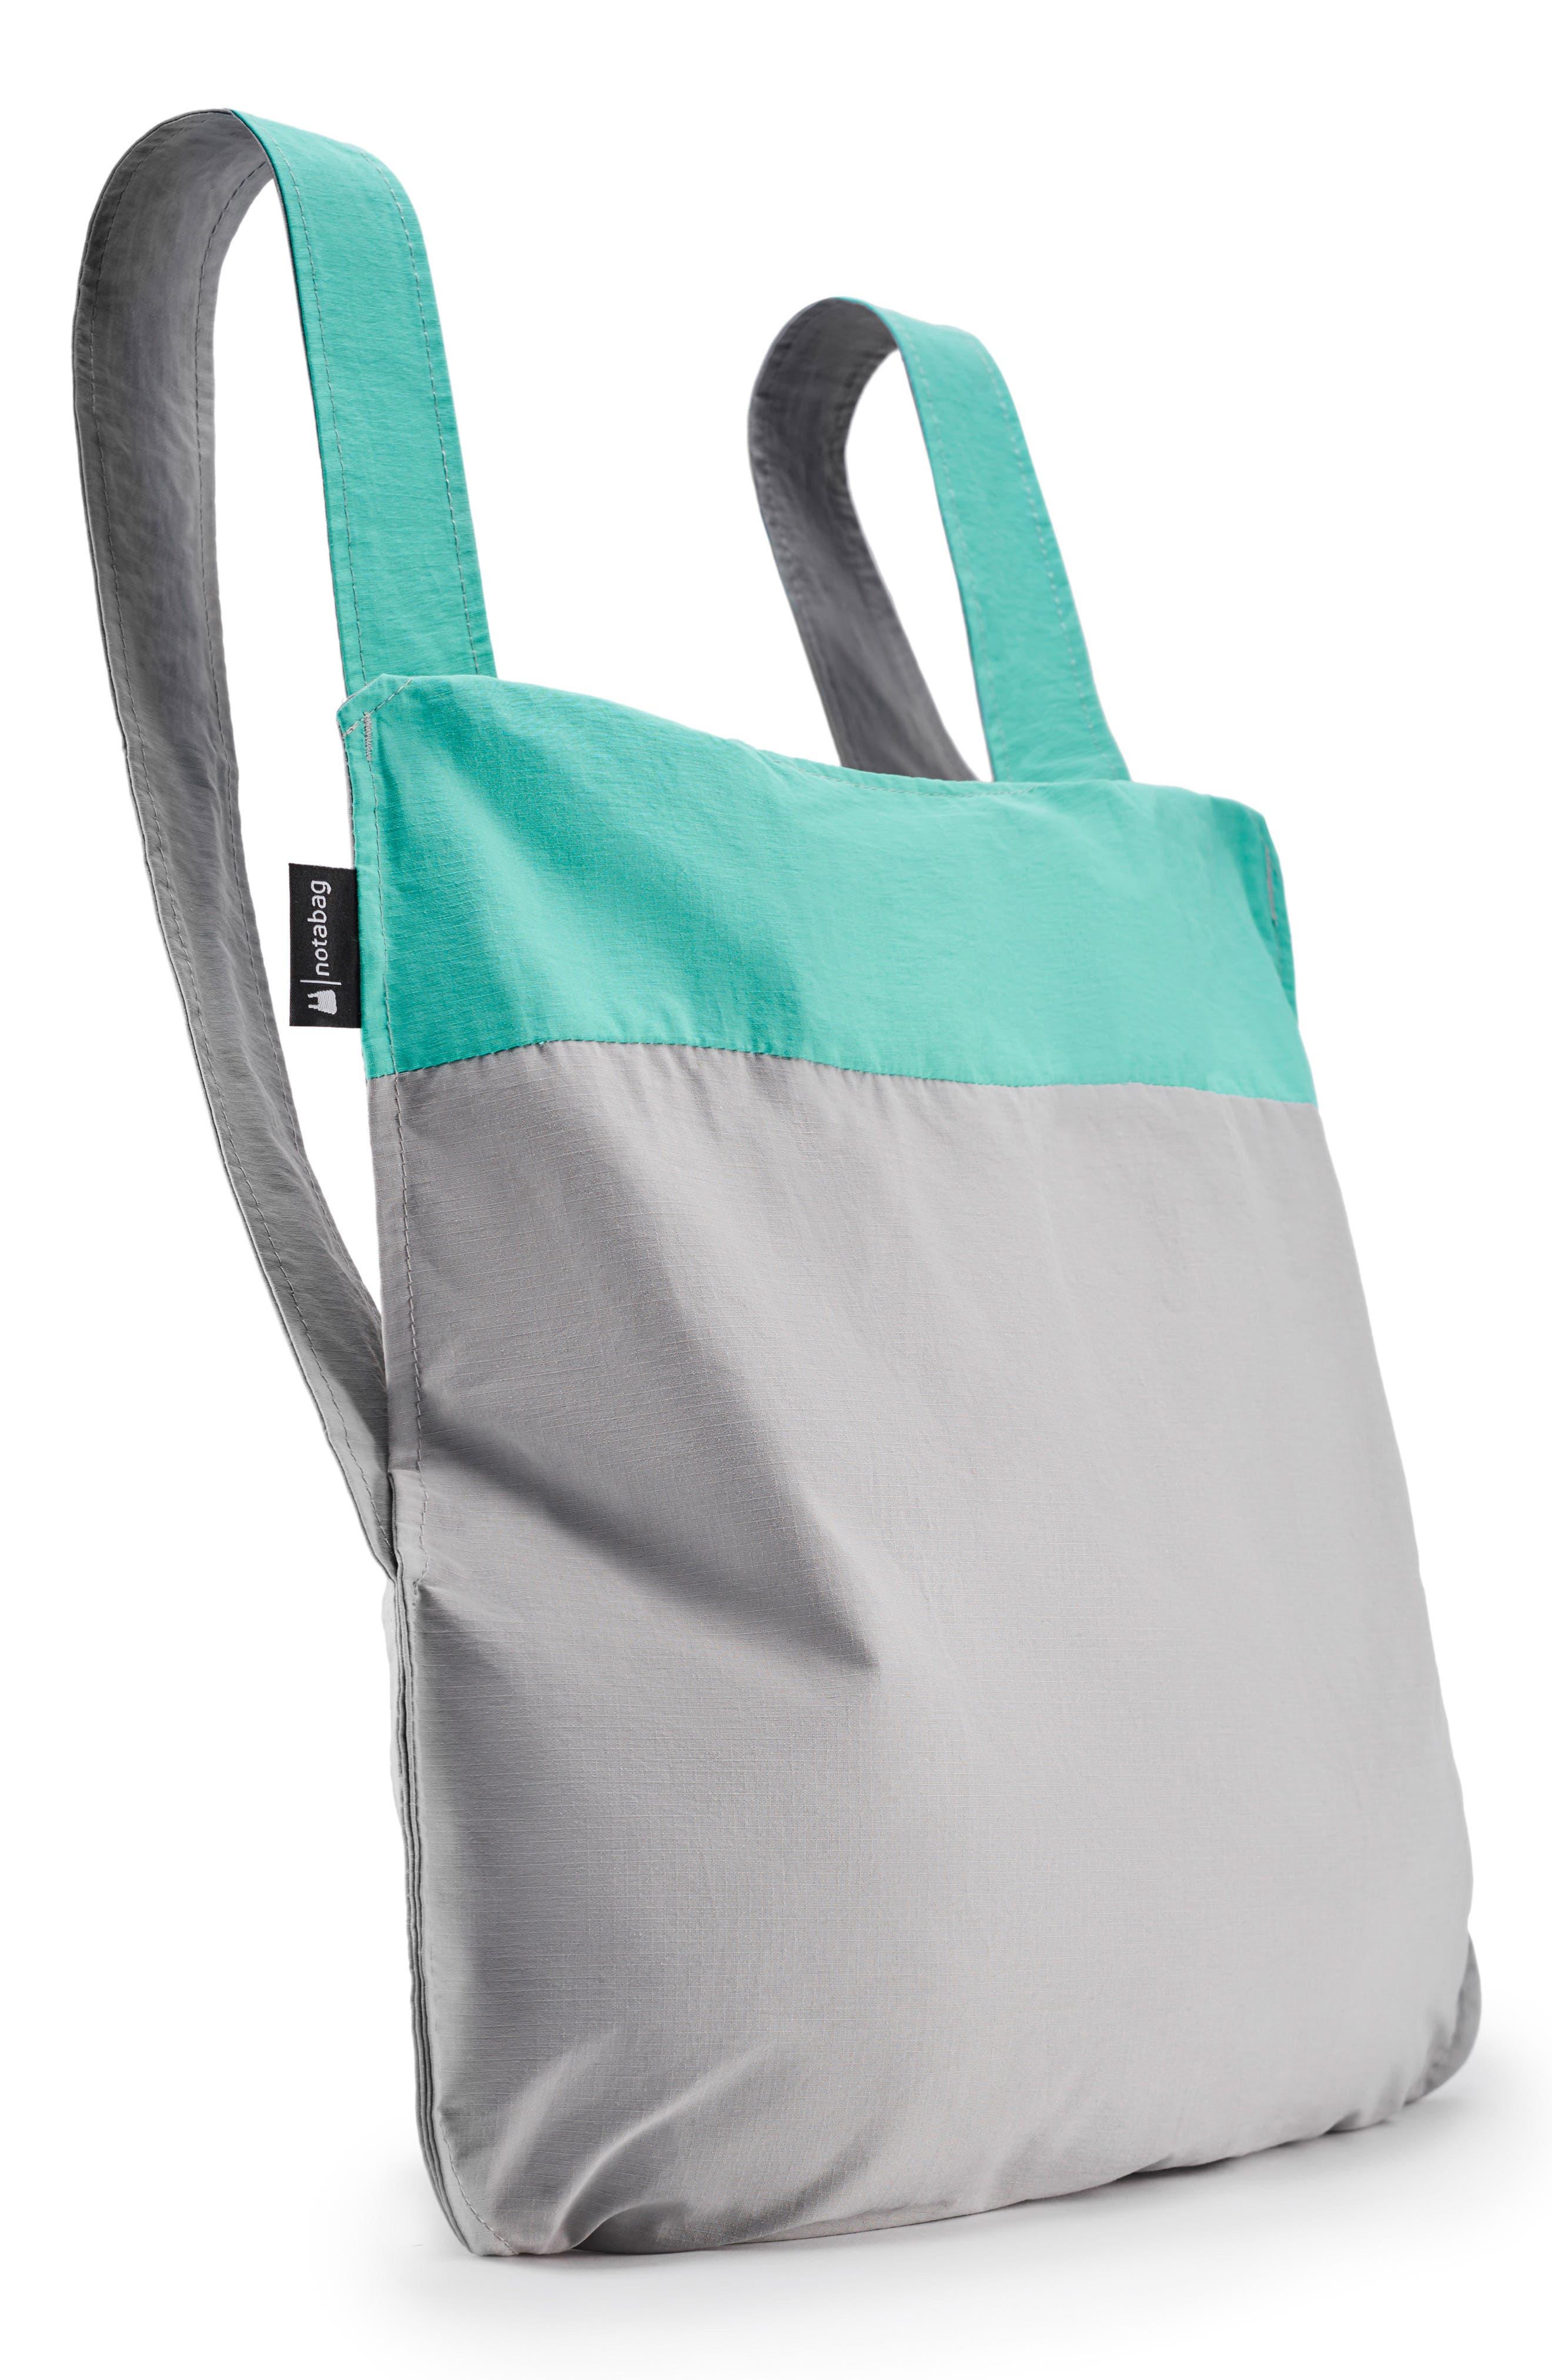 NOTABAG Convertible Tote Backpack, Main, color, MINT/ GREY